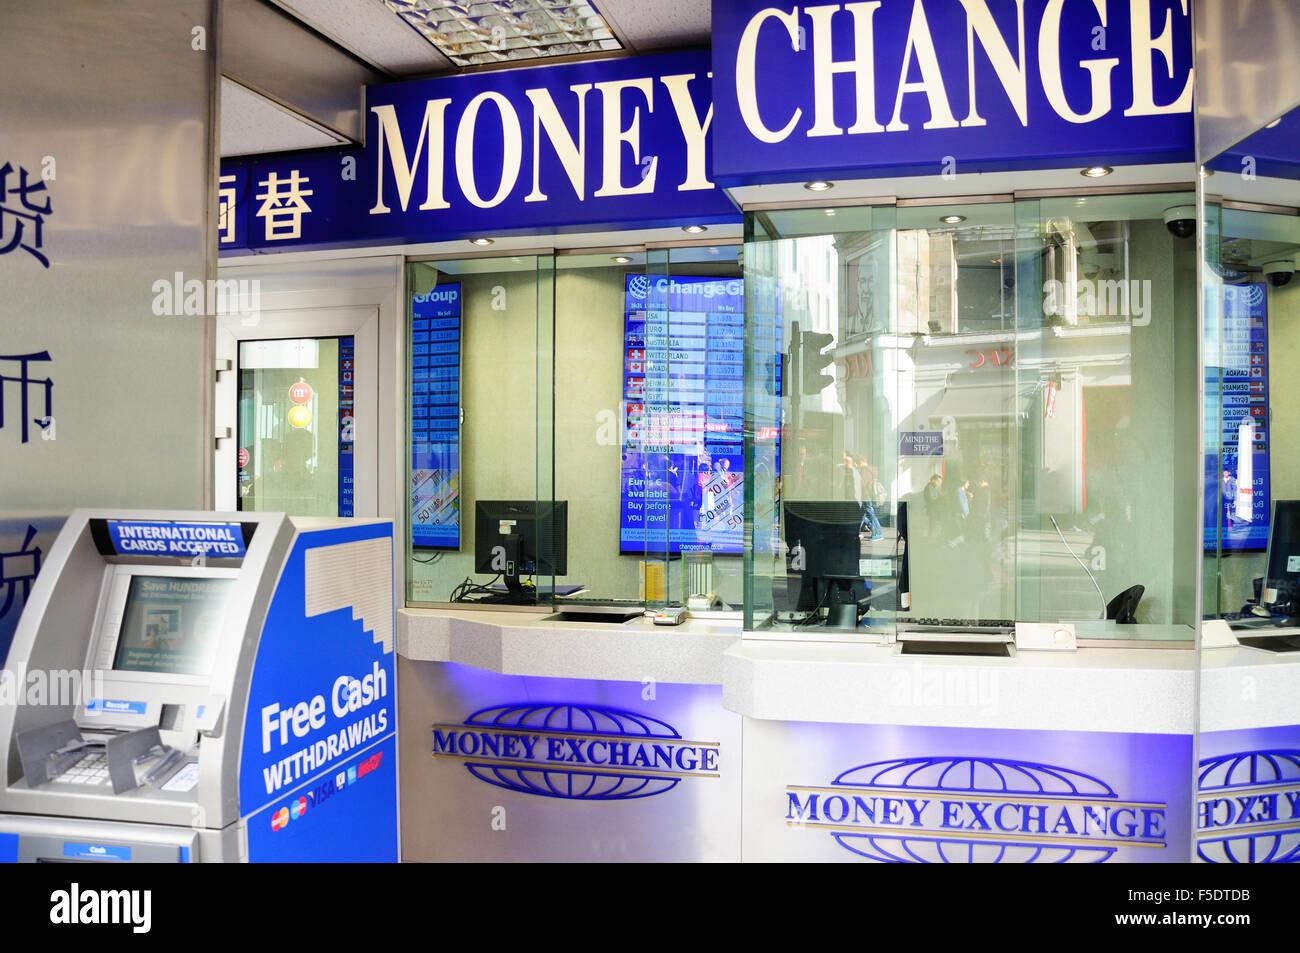 Changing Money Stock Photos Amp Changing Money Stock Images Alamy